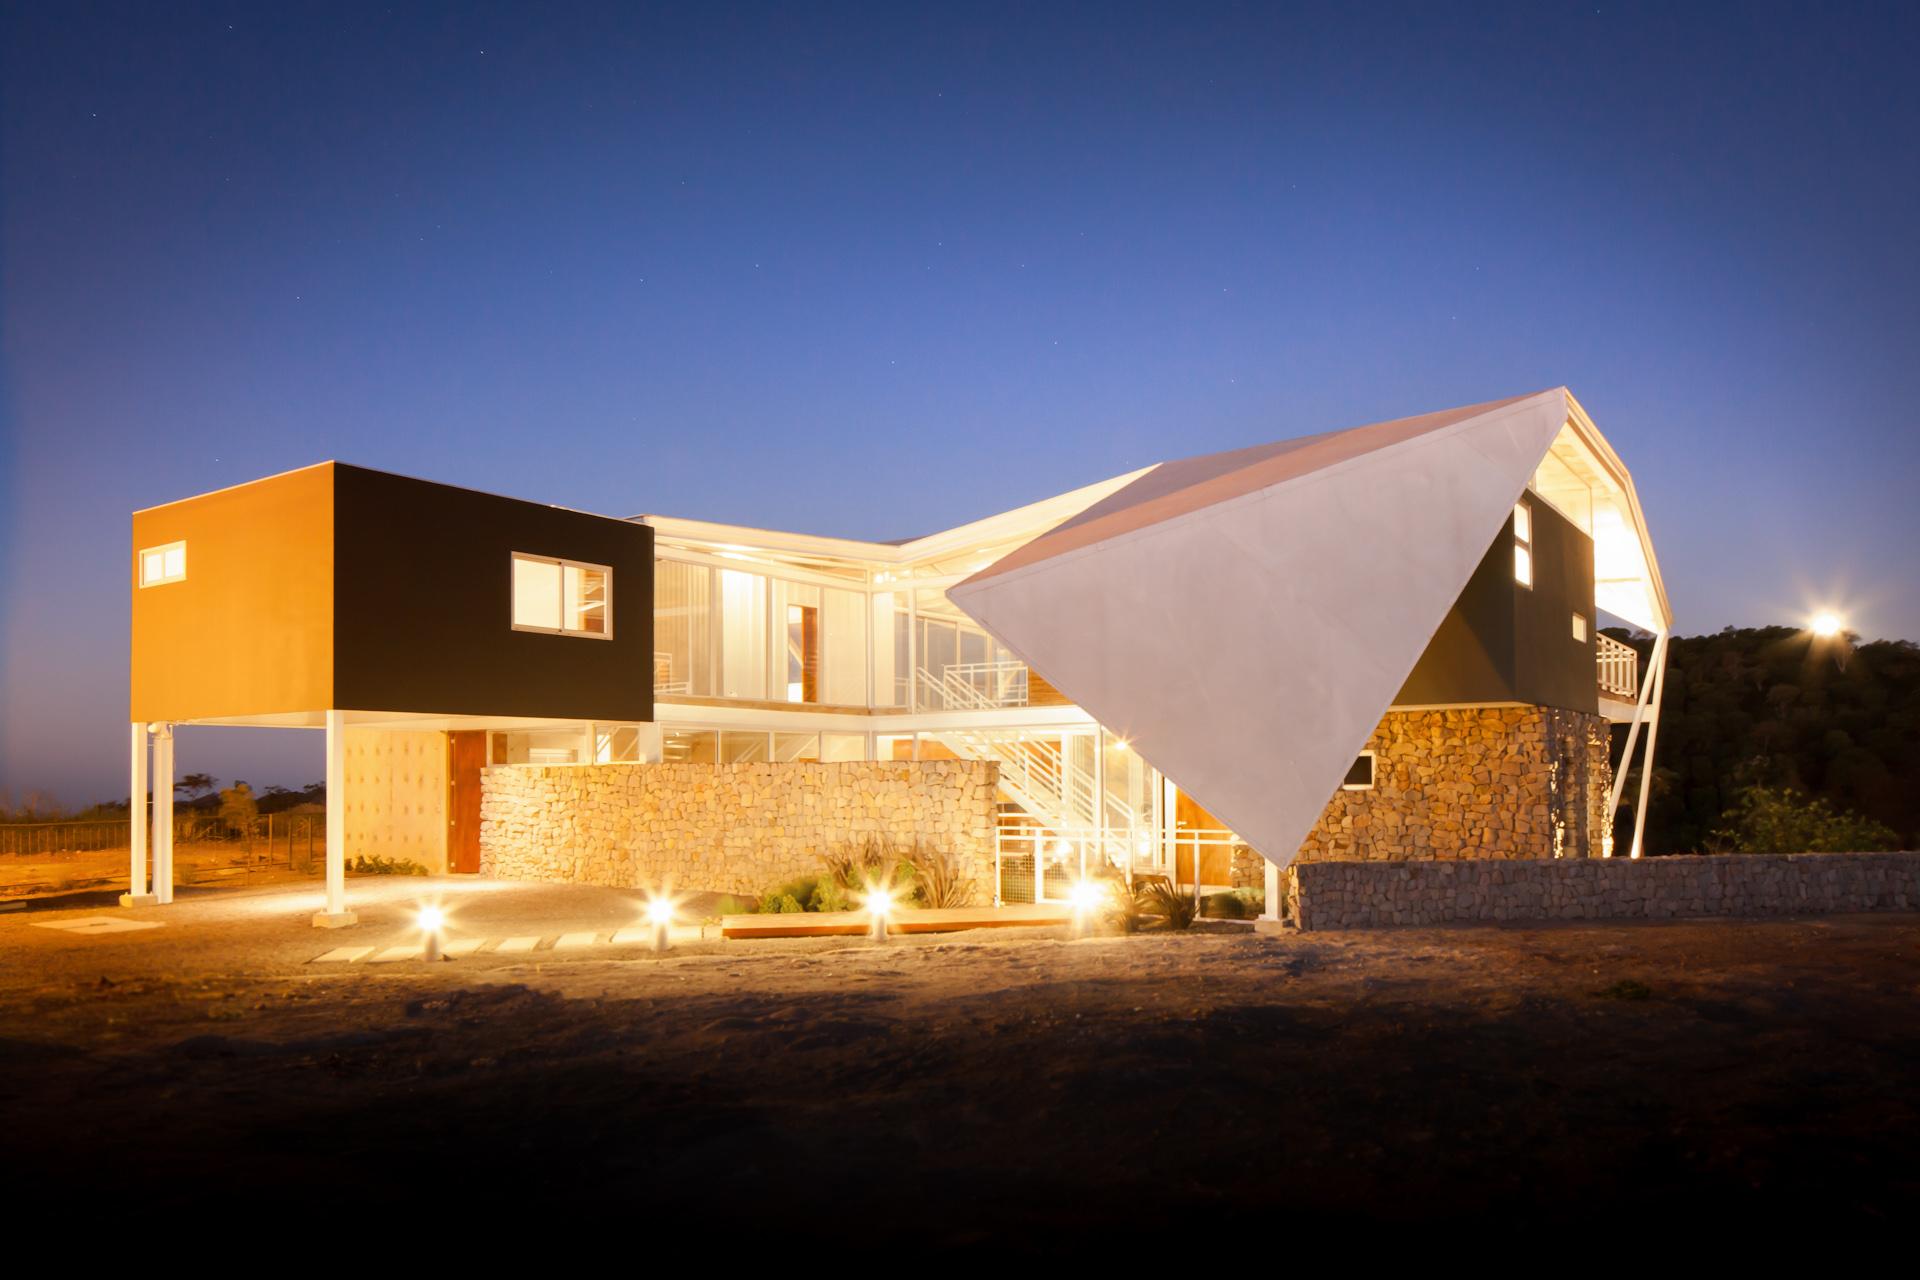 Architecture-Modern-La-Piscucha-El-Salvador-Jason-Bax-Dwell-01.JPG